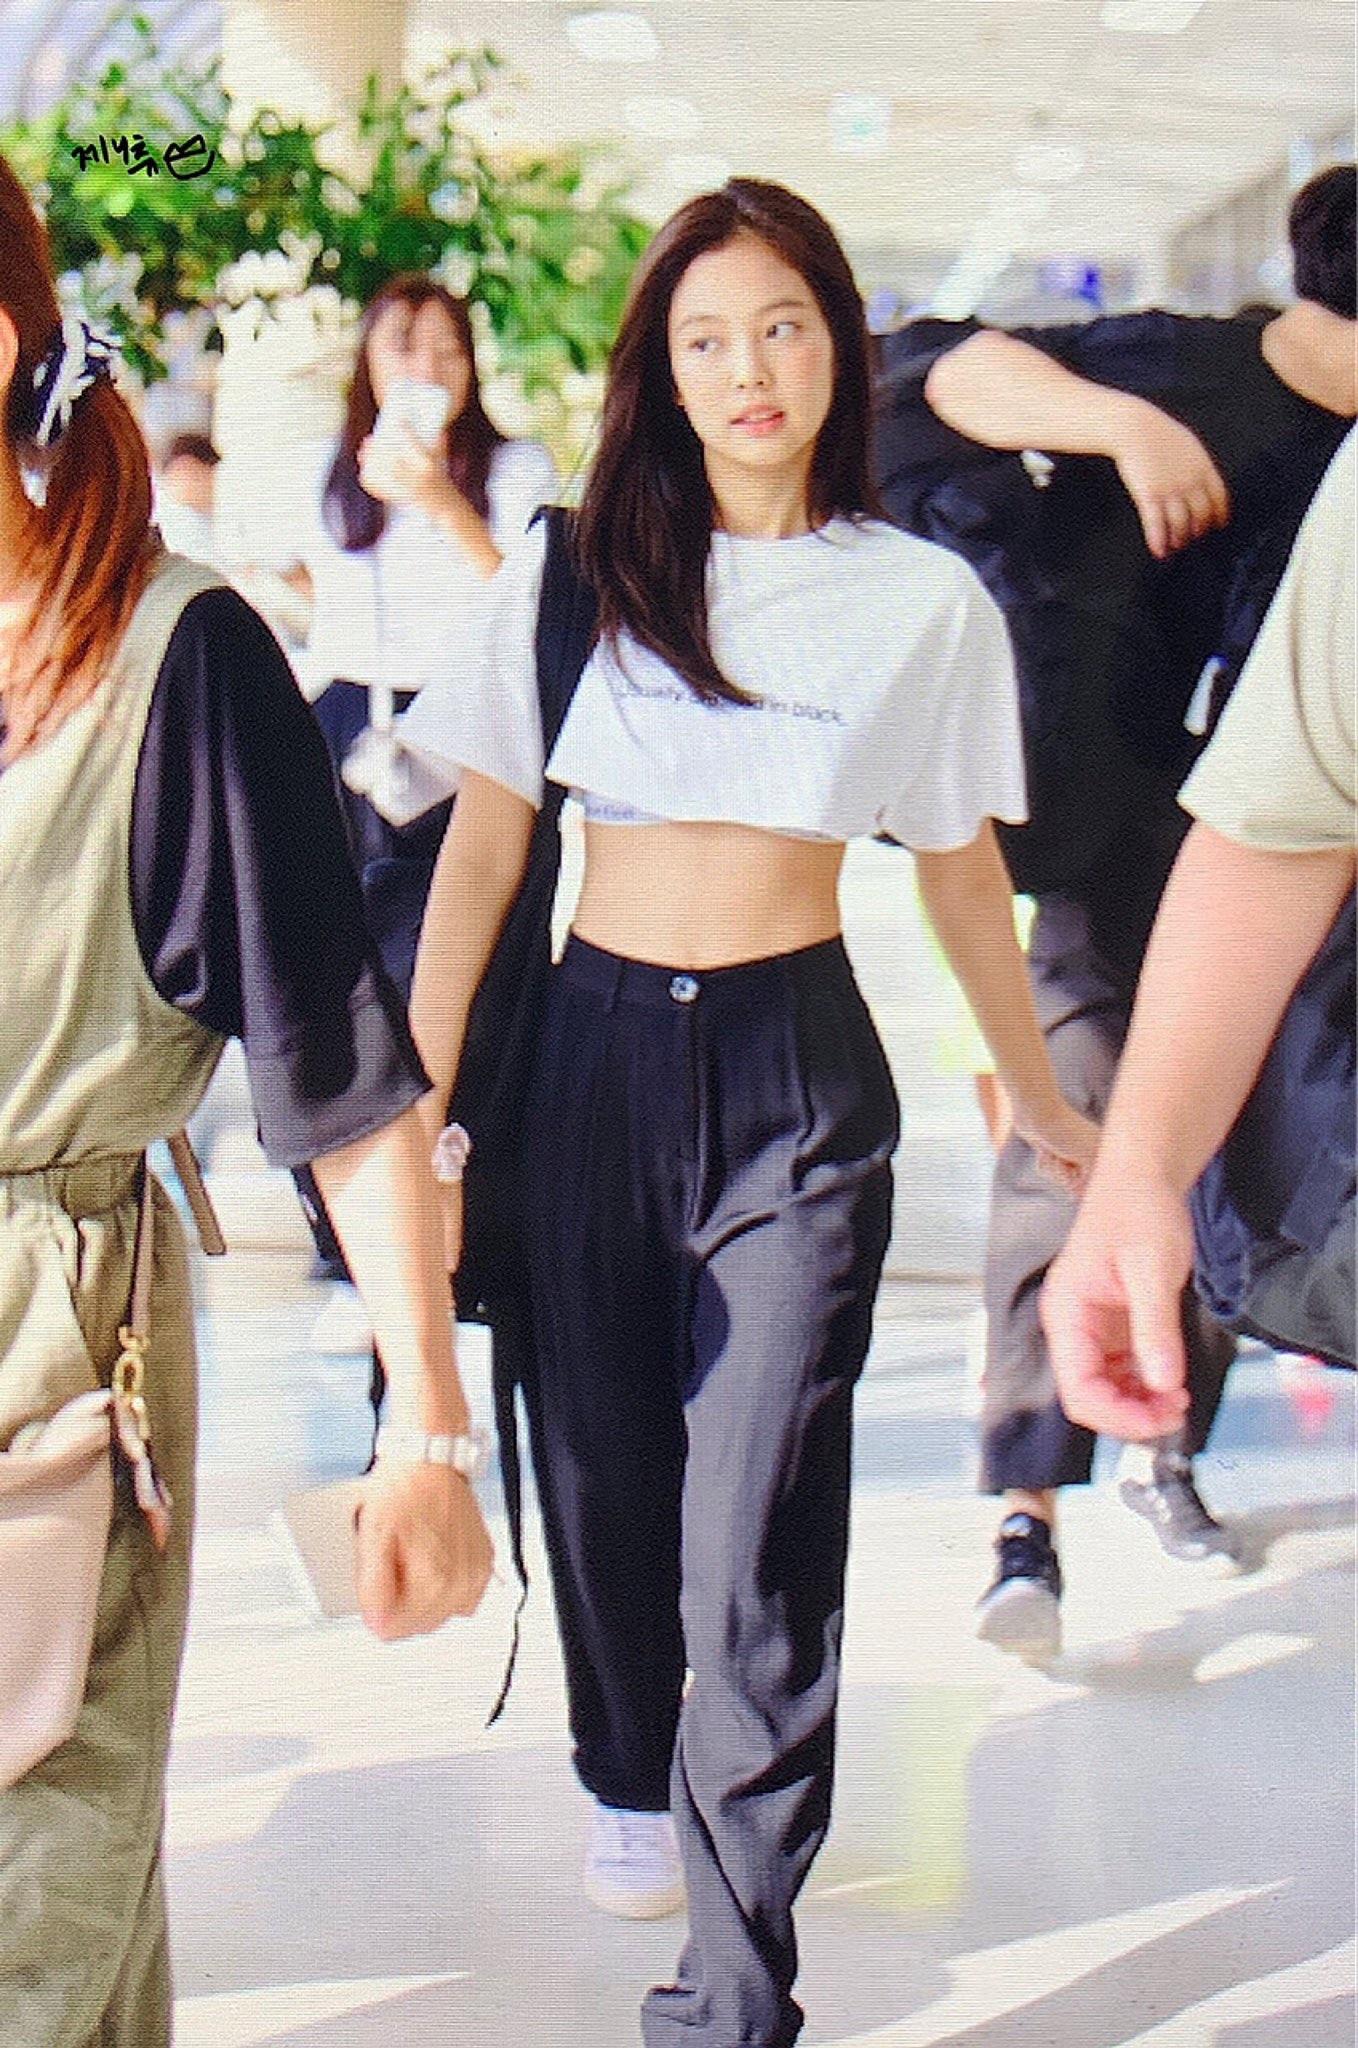 Kpop Blackpink JENNIE Korea Summer Straight Pants Women Streetwear Black Fashion High Waist Loose Trousers Casual Wide Leg Pants